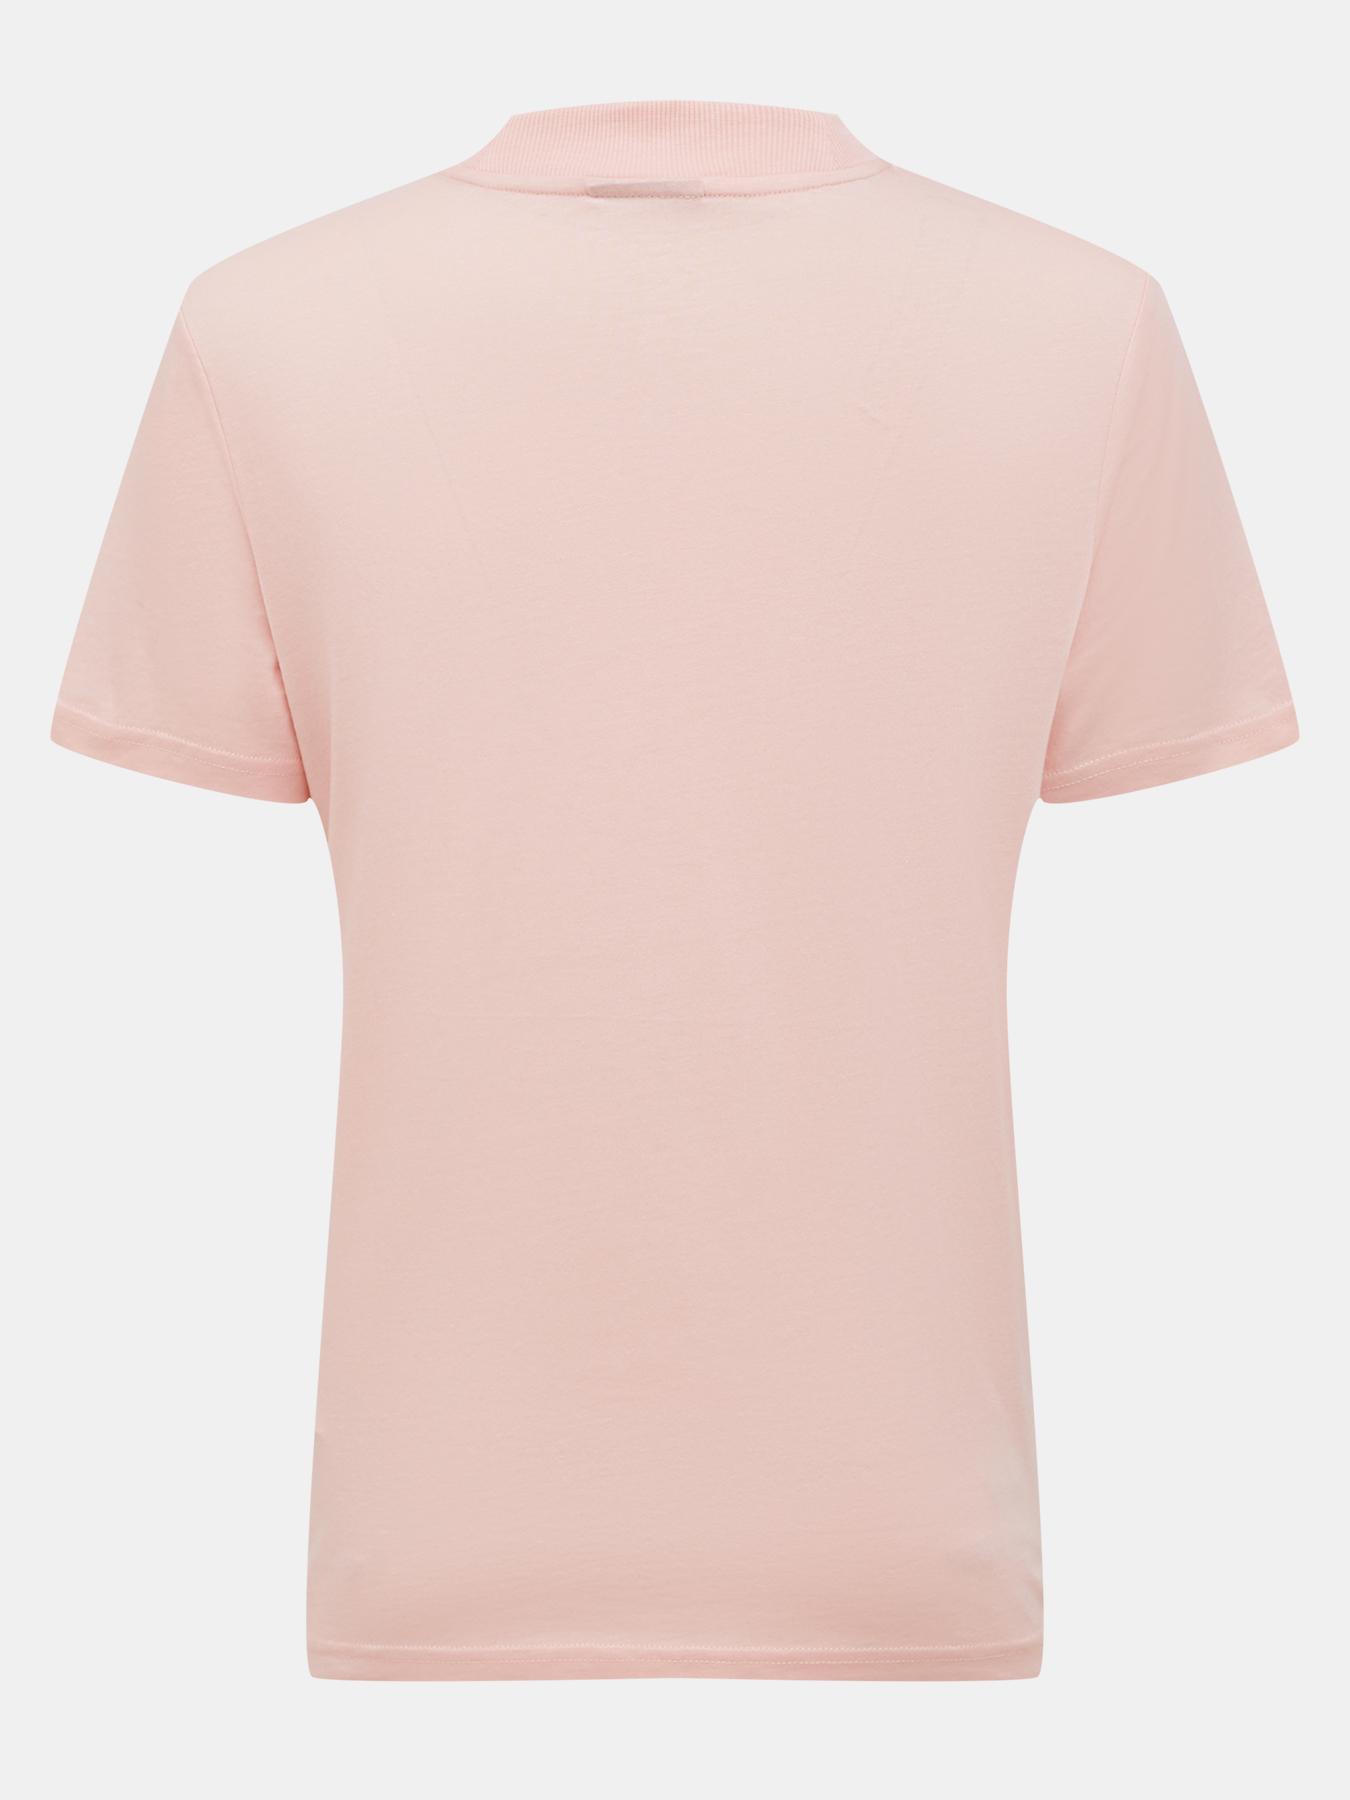 Фуфайка (футболка) HUGO Футболка Dennile фуфайка футболка hugo футболка drosal